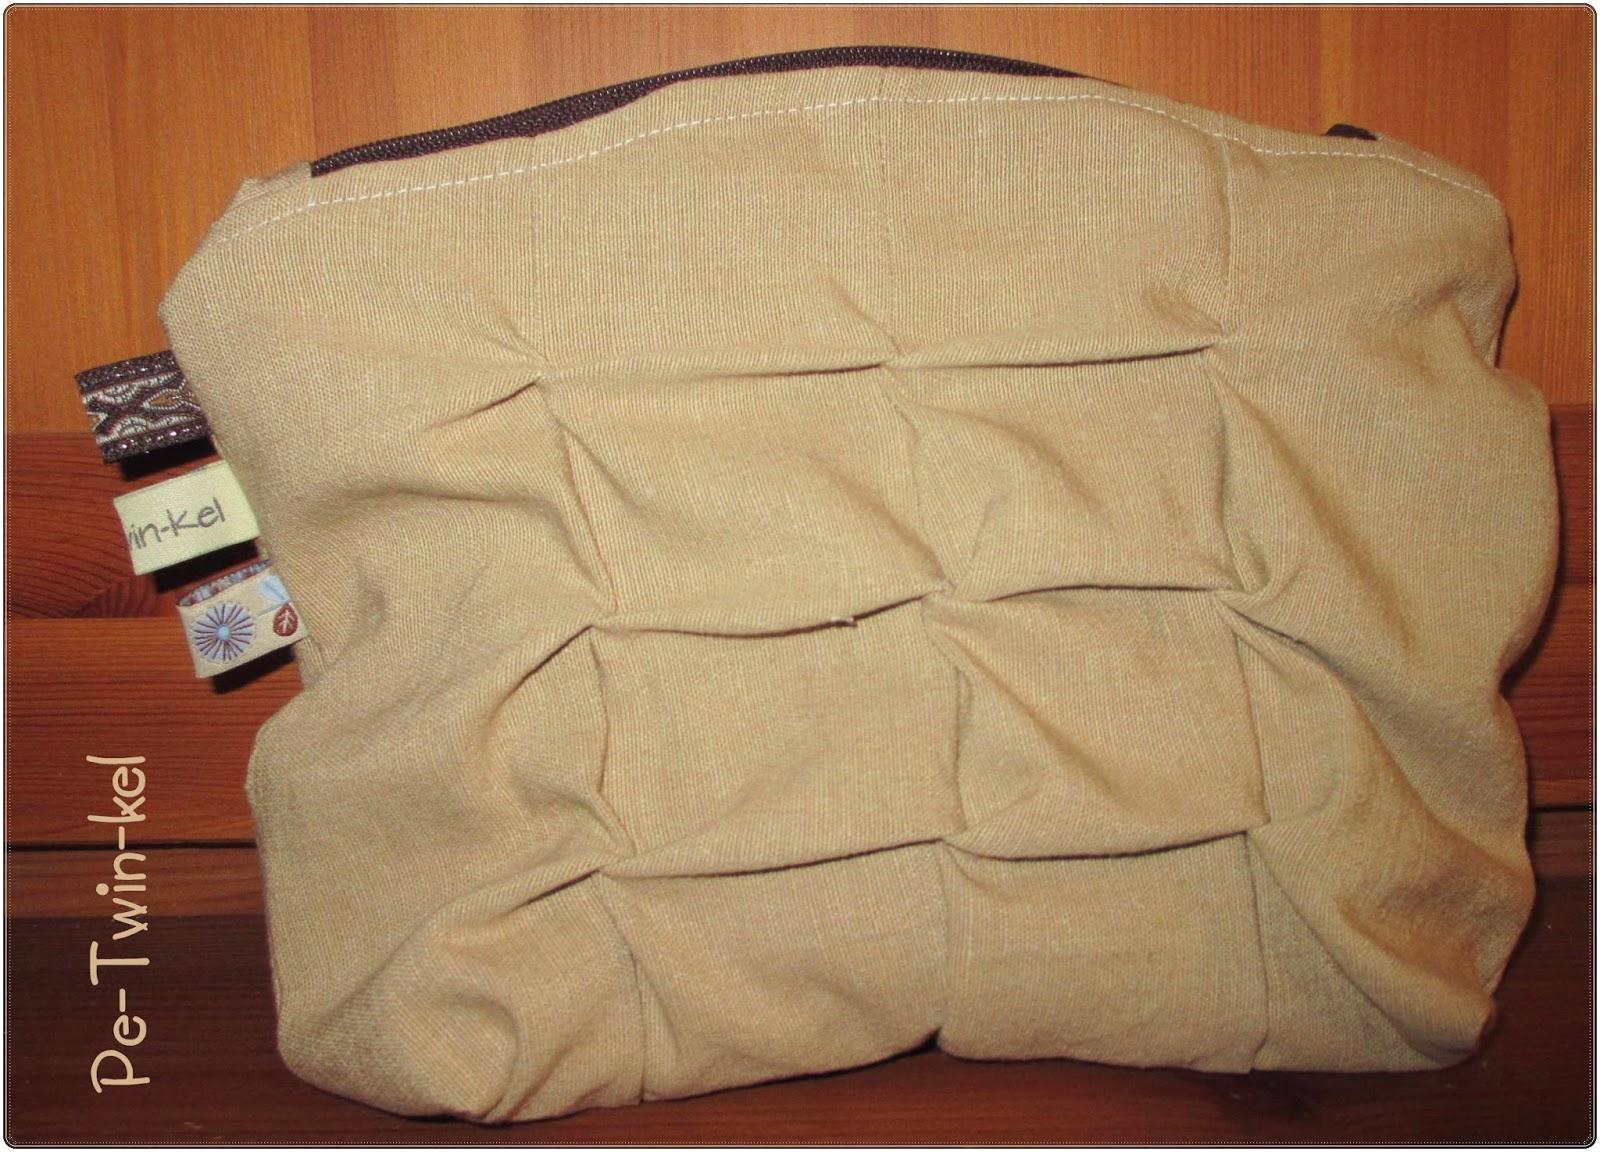 pe twin kel taschenspieler ii sew along mit der kosmetiktasche. Black Bedroom Furniture Sets. Home Design Ideas